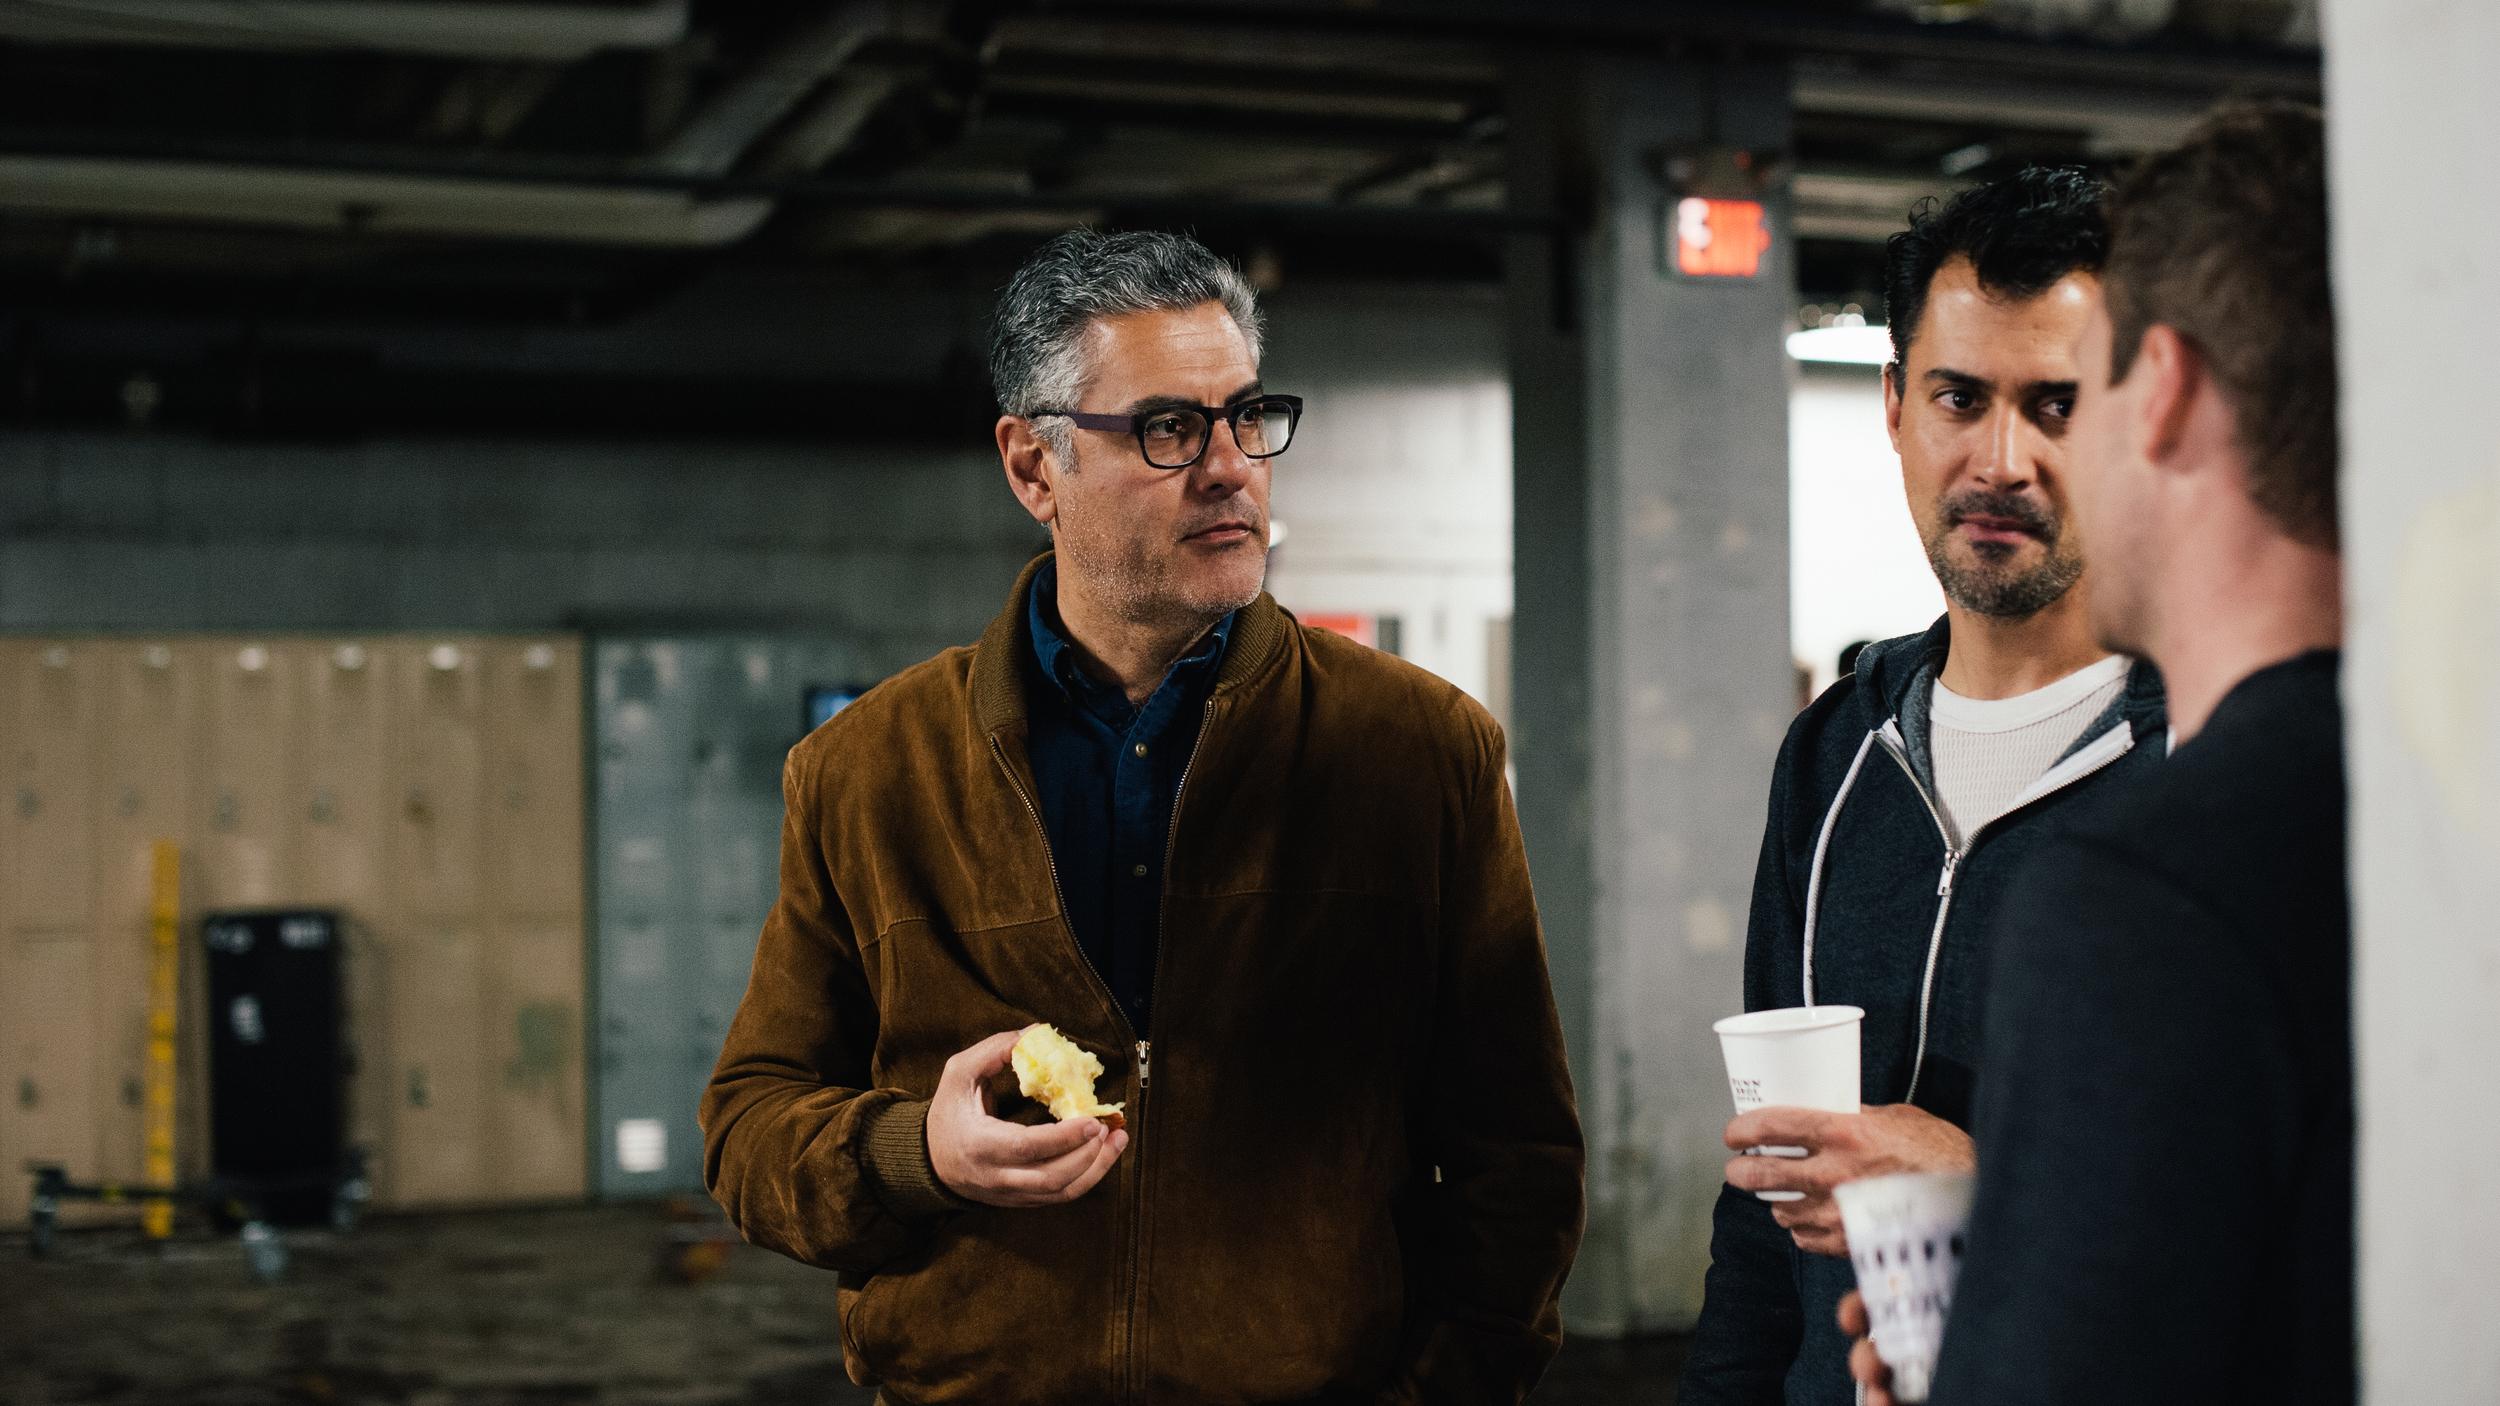 Producers Michael Jurayj and Aaron Courteau